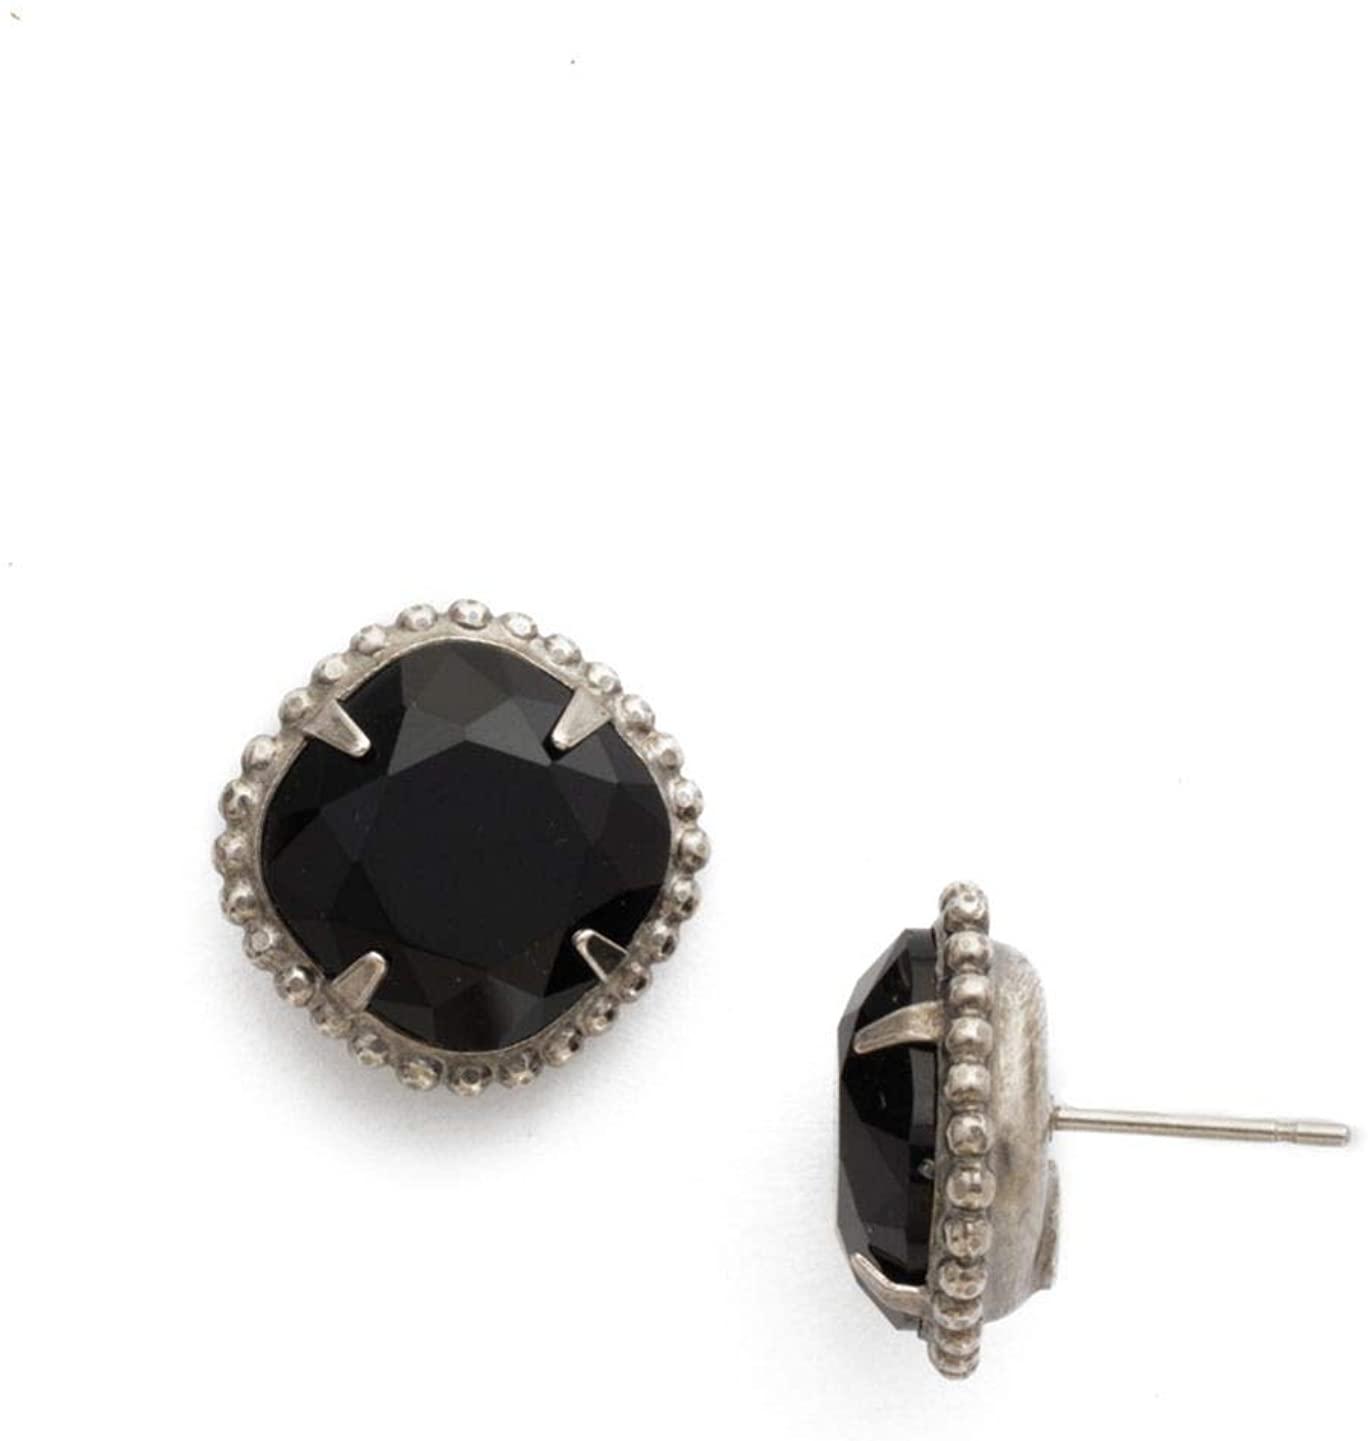 Sorrelli Essentials Cushion-Cut Solitaire Stud Earrings, Antique Silver Finish, Jet